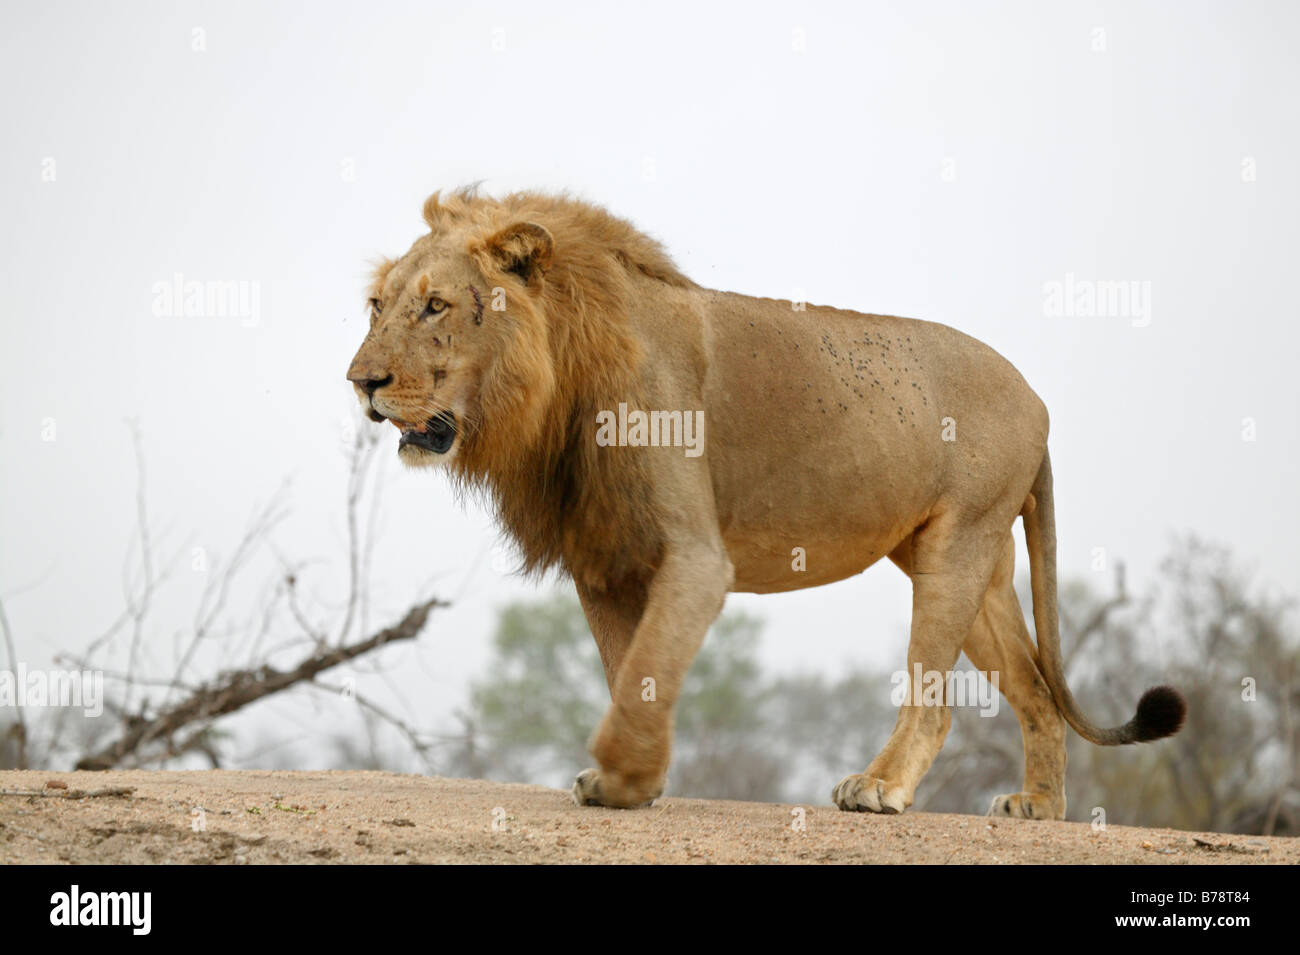 Male Lion Walking Side View Stock Photos & Male Lion ... - photo#2